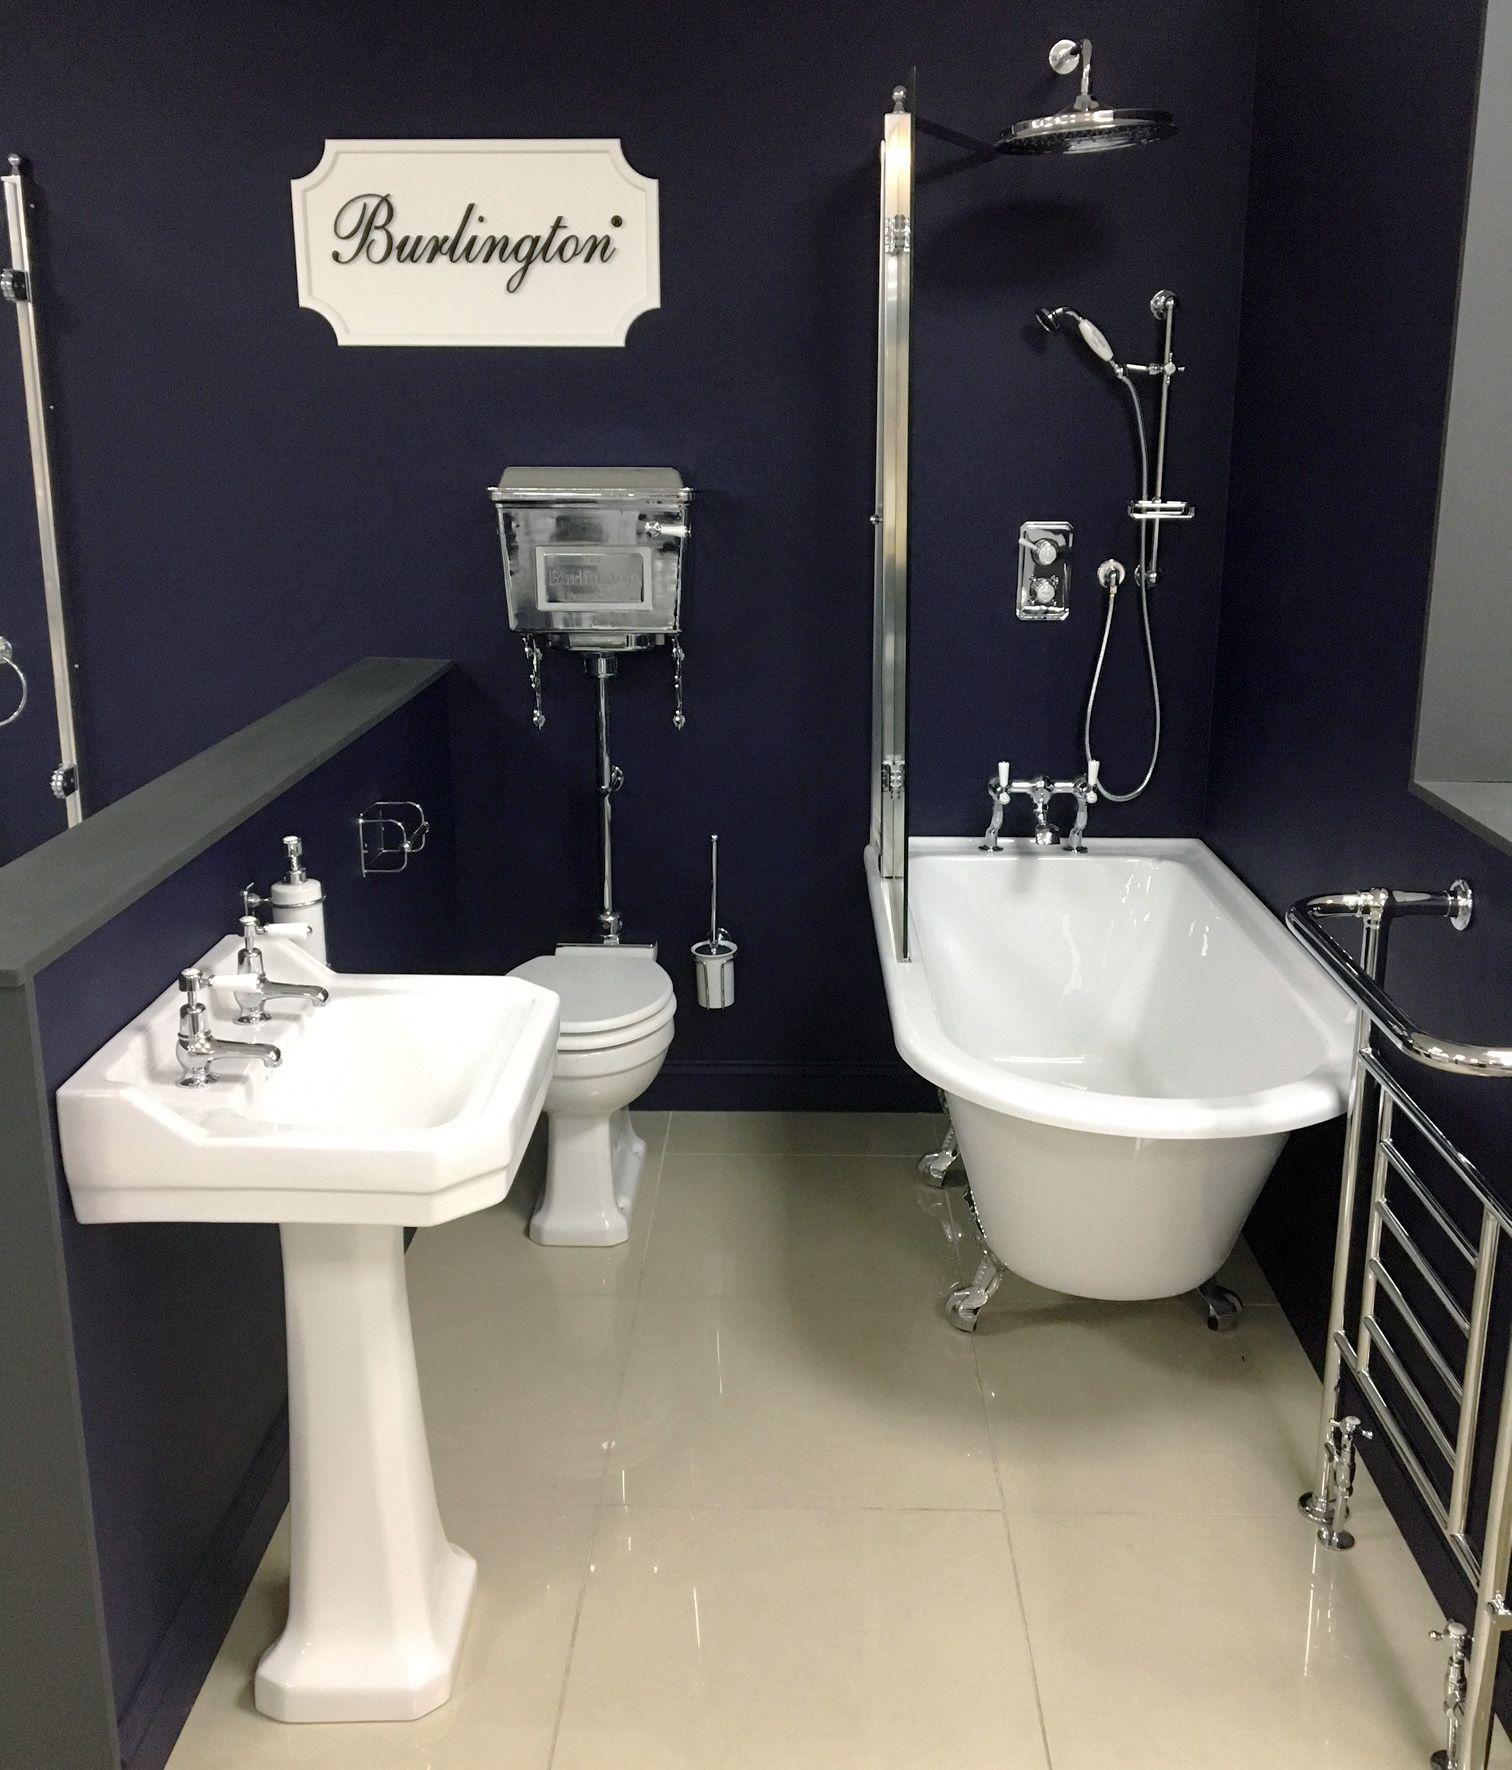 Badezimmer We Have Some Lovely New Burlington Displays On At Our North Shields Stockton Bathroom Interior Design Luxury Interior Design Small Bathroom Decor